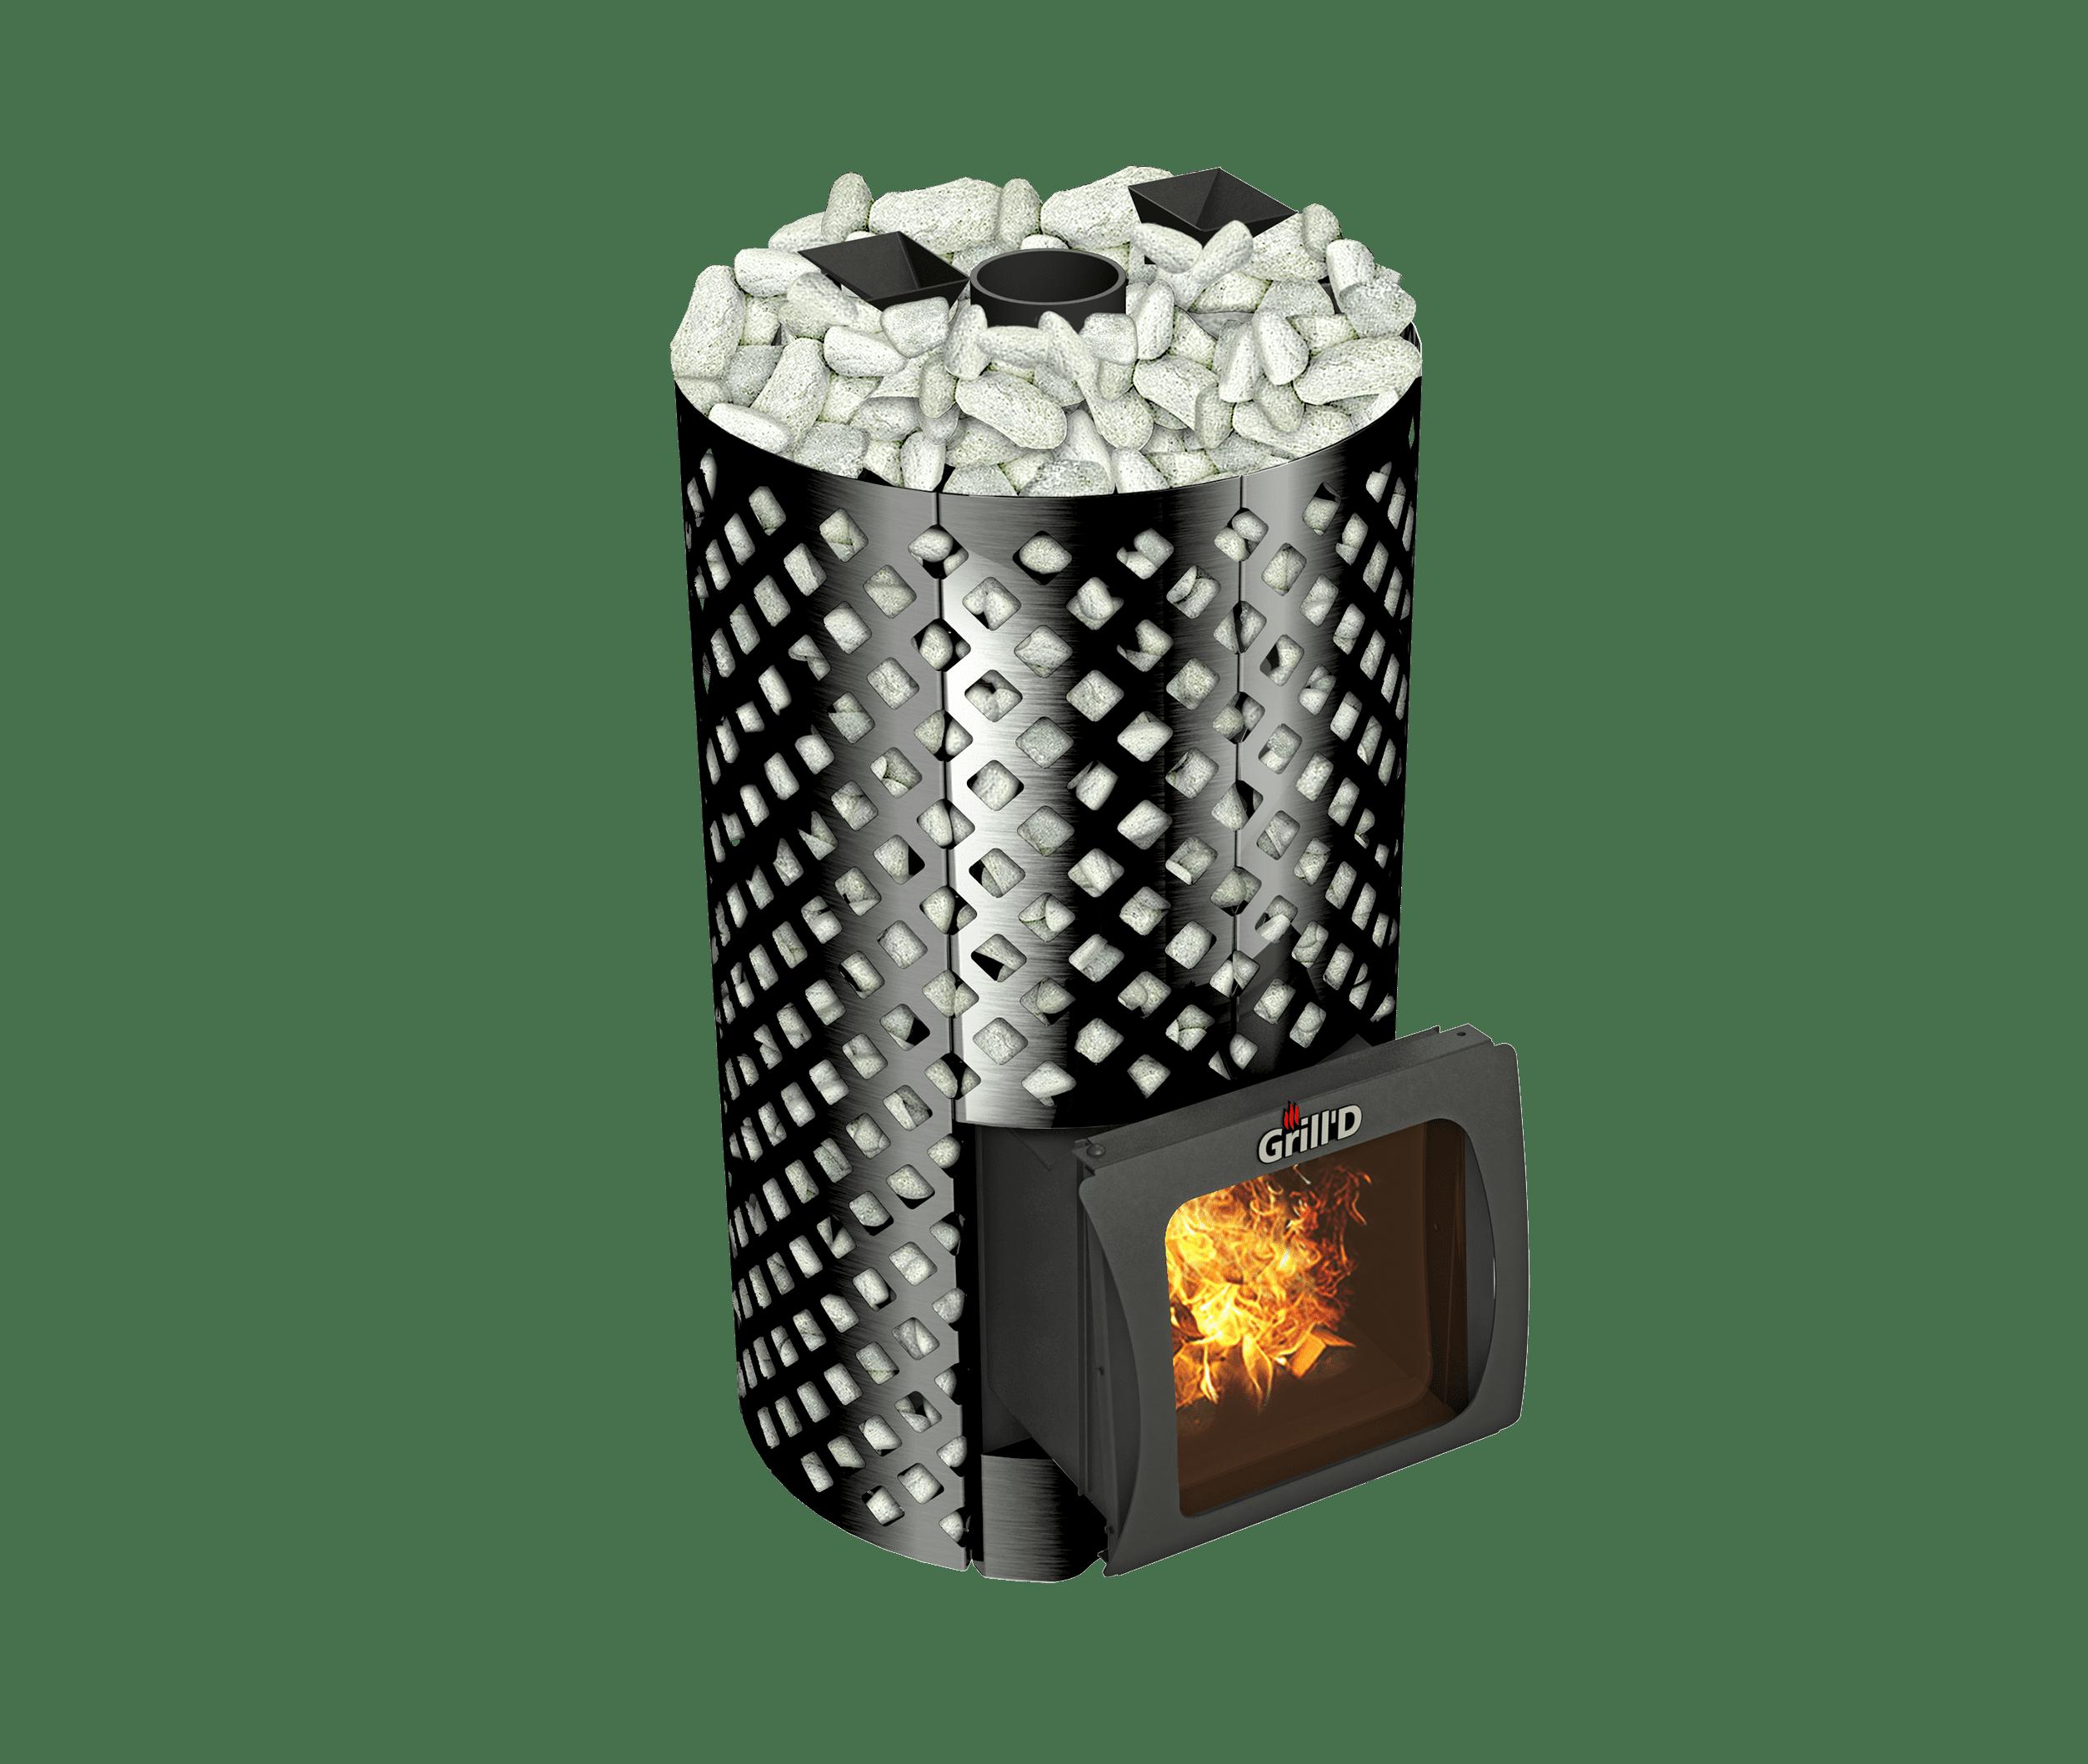 Банная печь Grill'D Violet World Romb Short Window Max (Жадеит 170 кг)